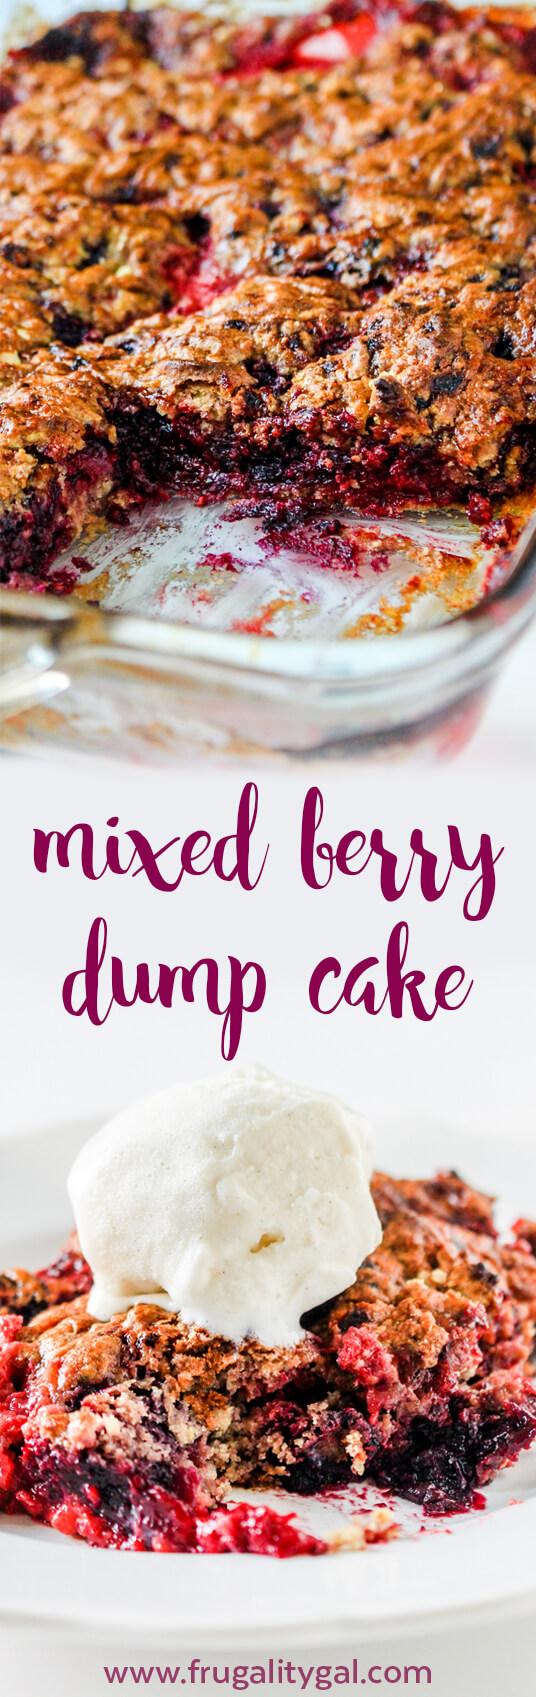 Mixed Berry Dump Cake Recipe